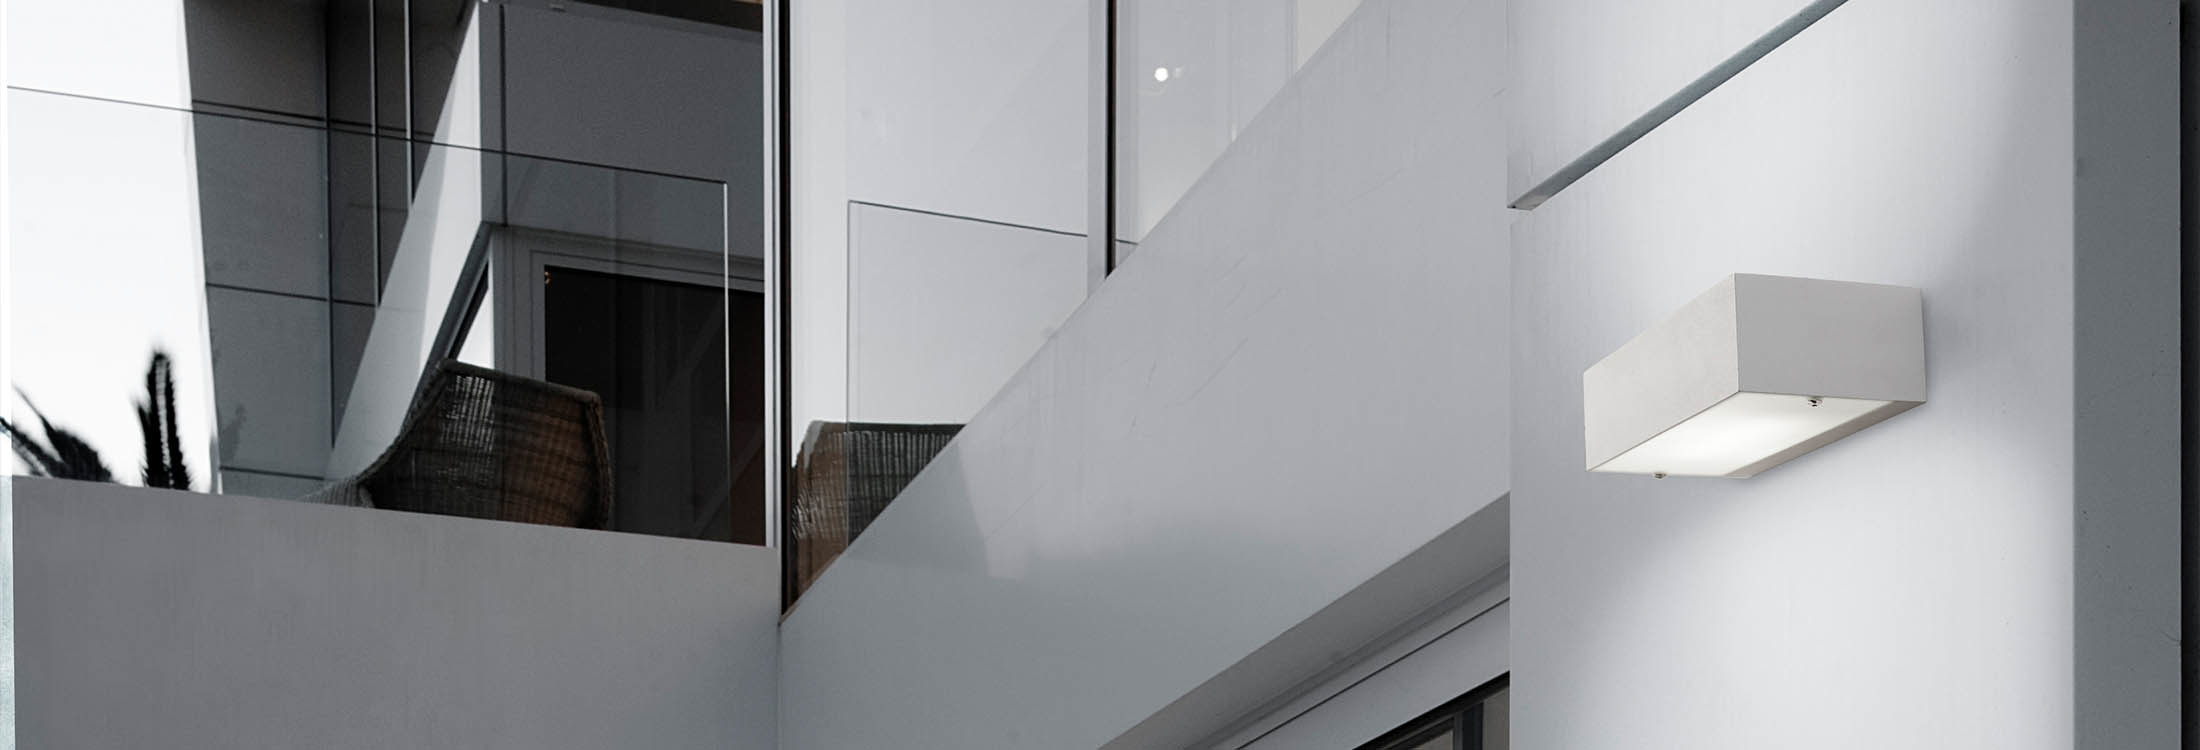 Buitenverlichting bij DesignmetLicht.nl